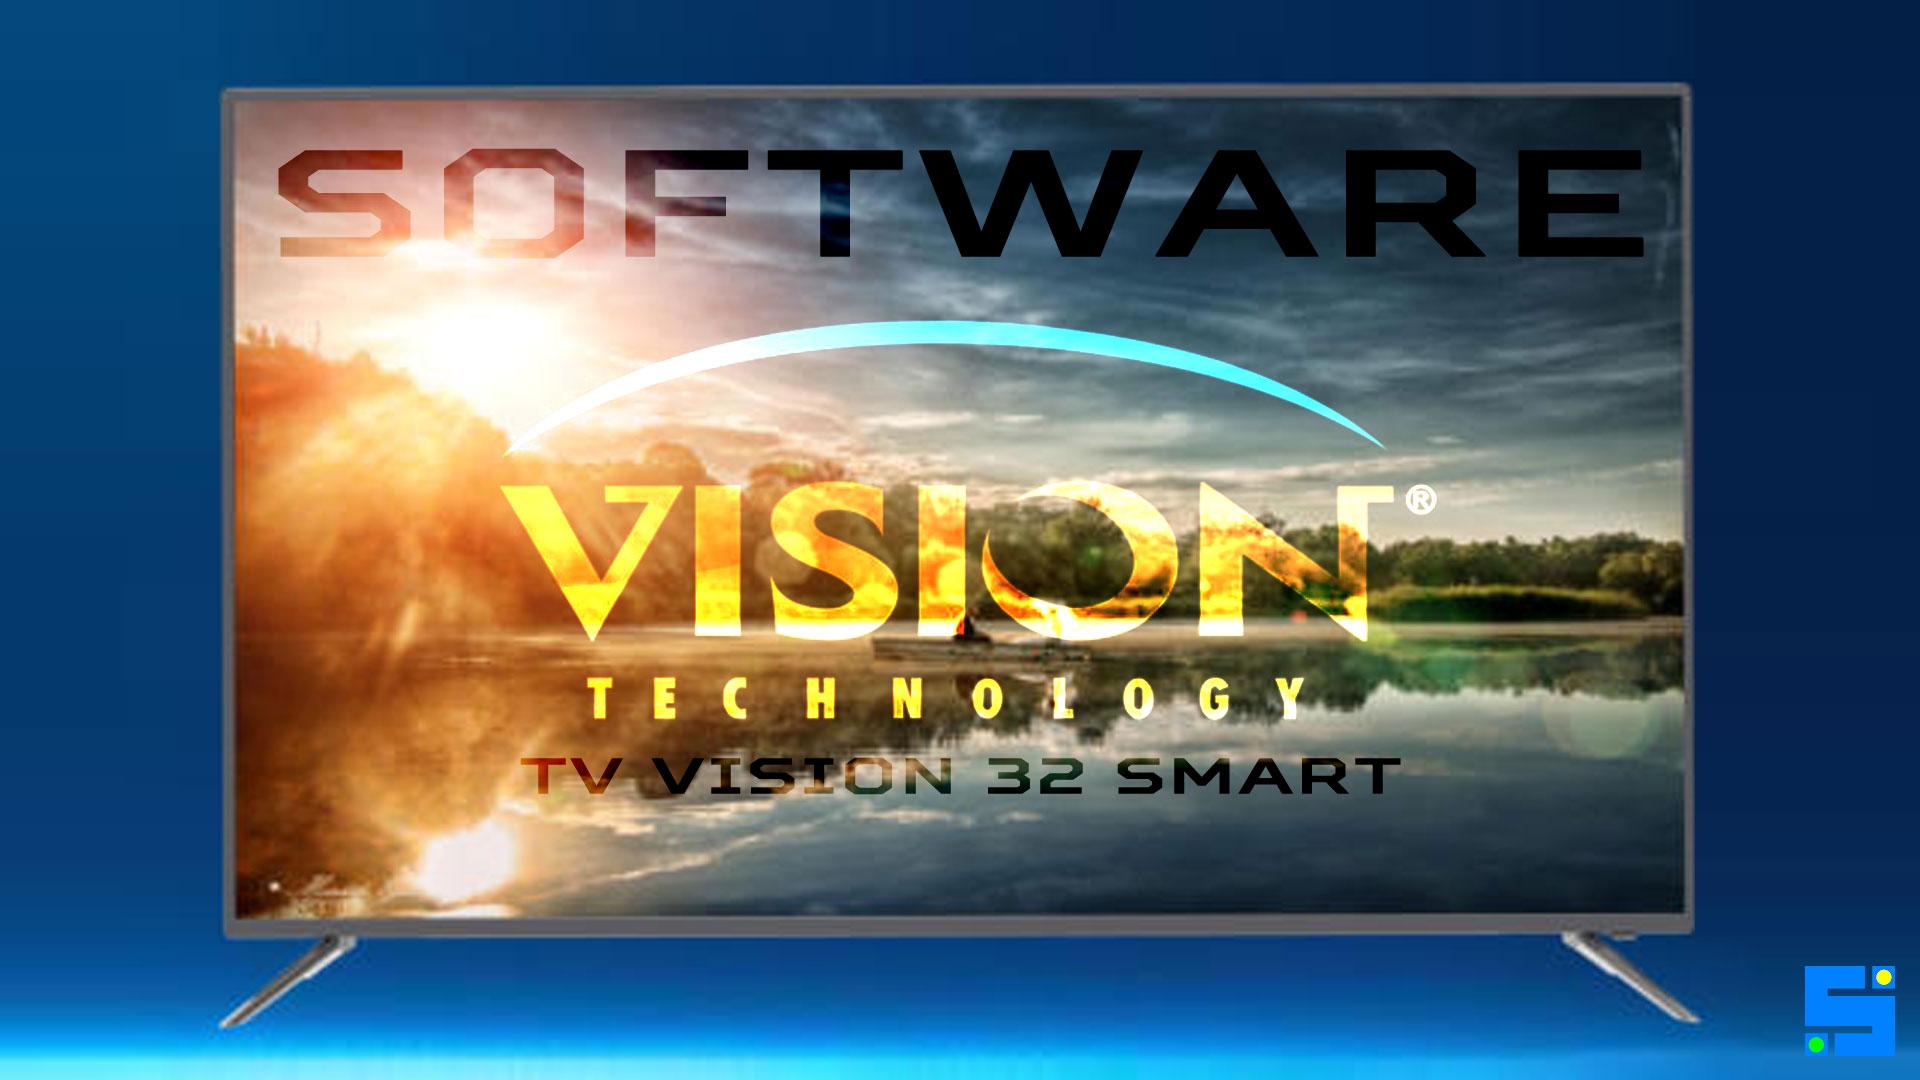 Download Software TV Vision 32 Smart New Update Firmware